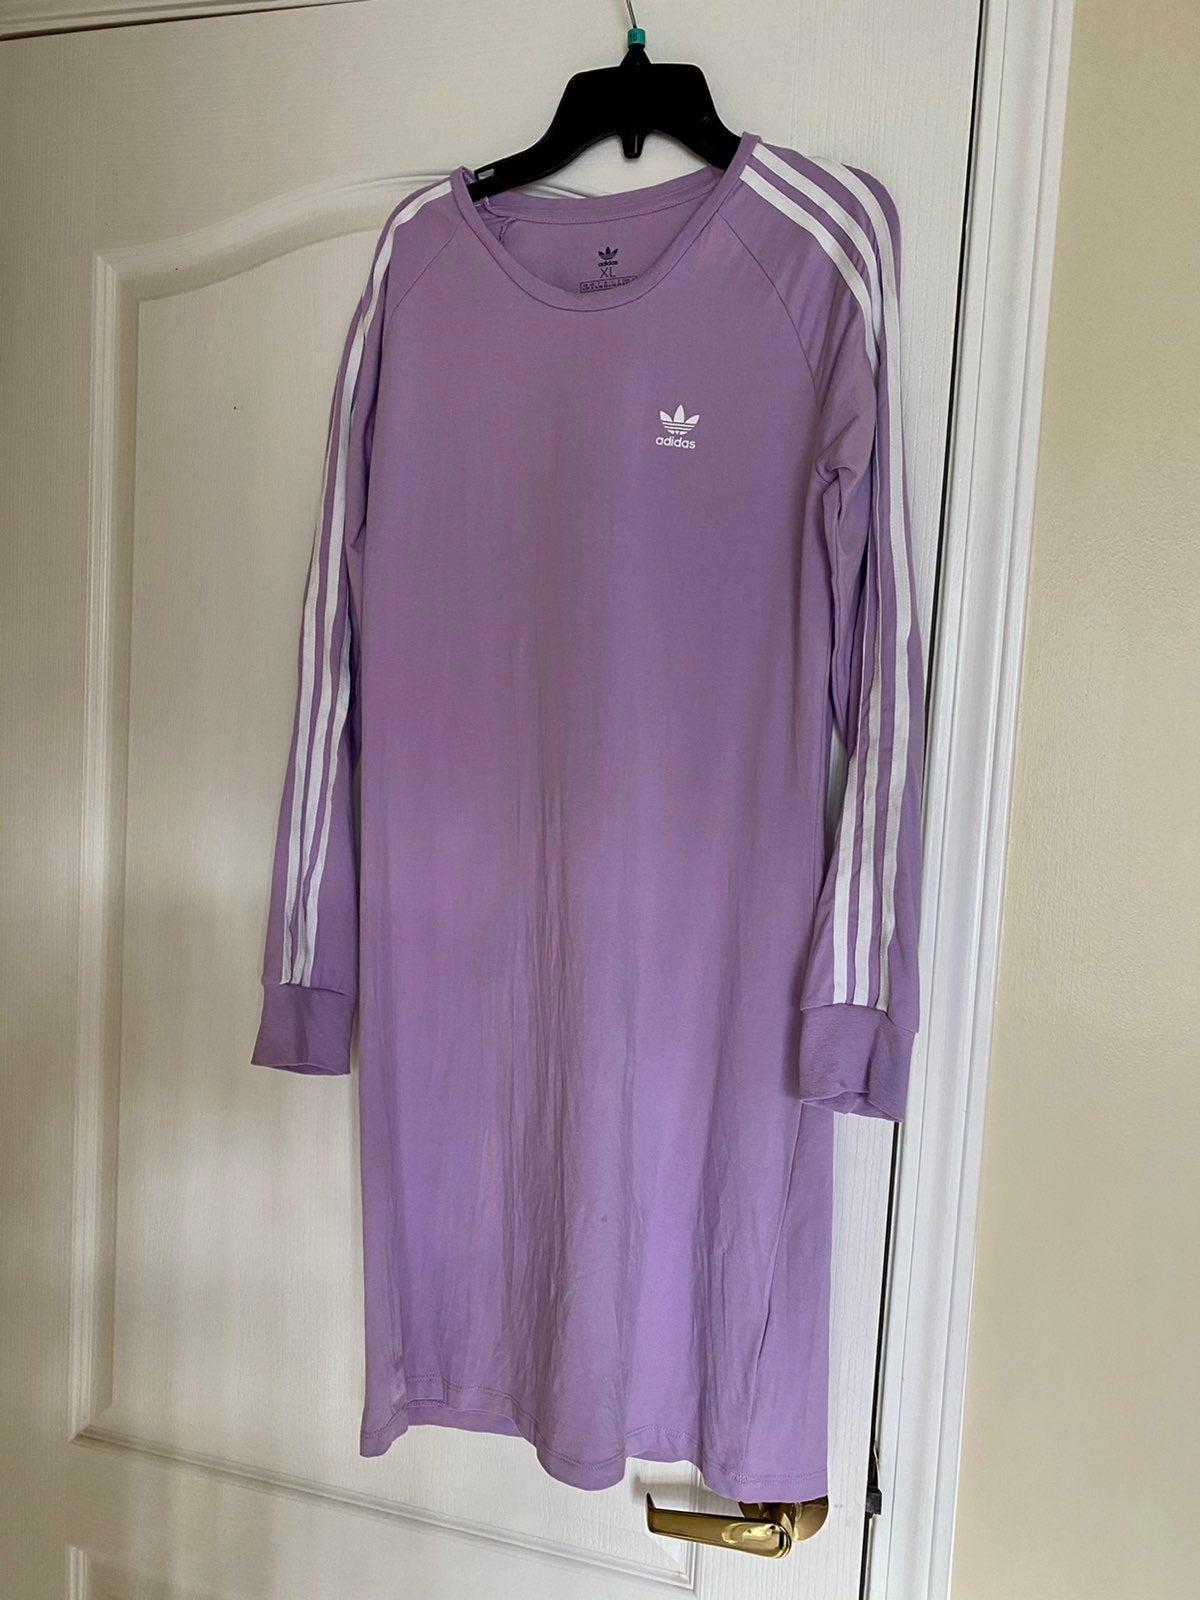 Adidas dress XL girls purple